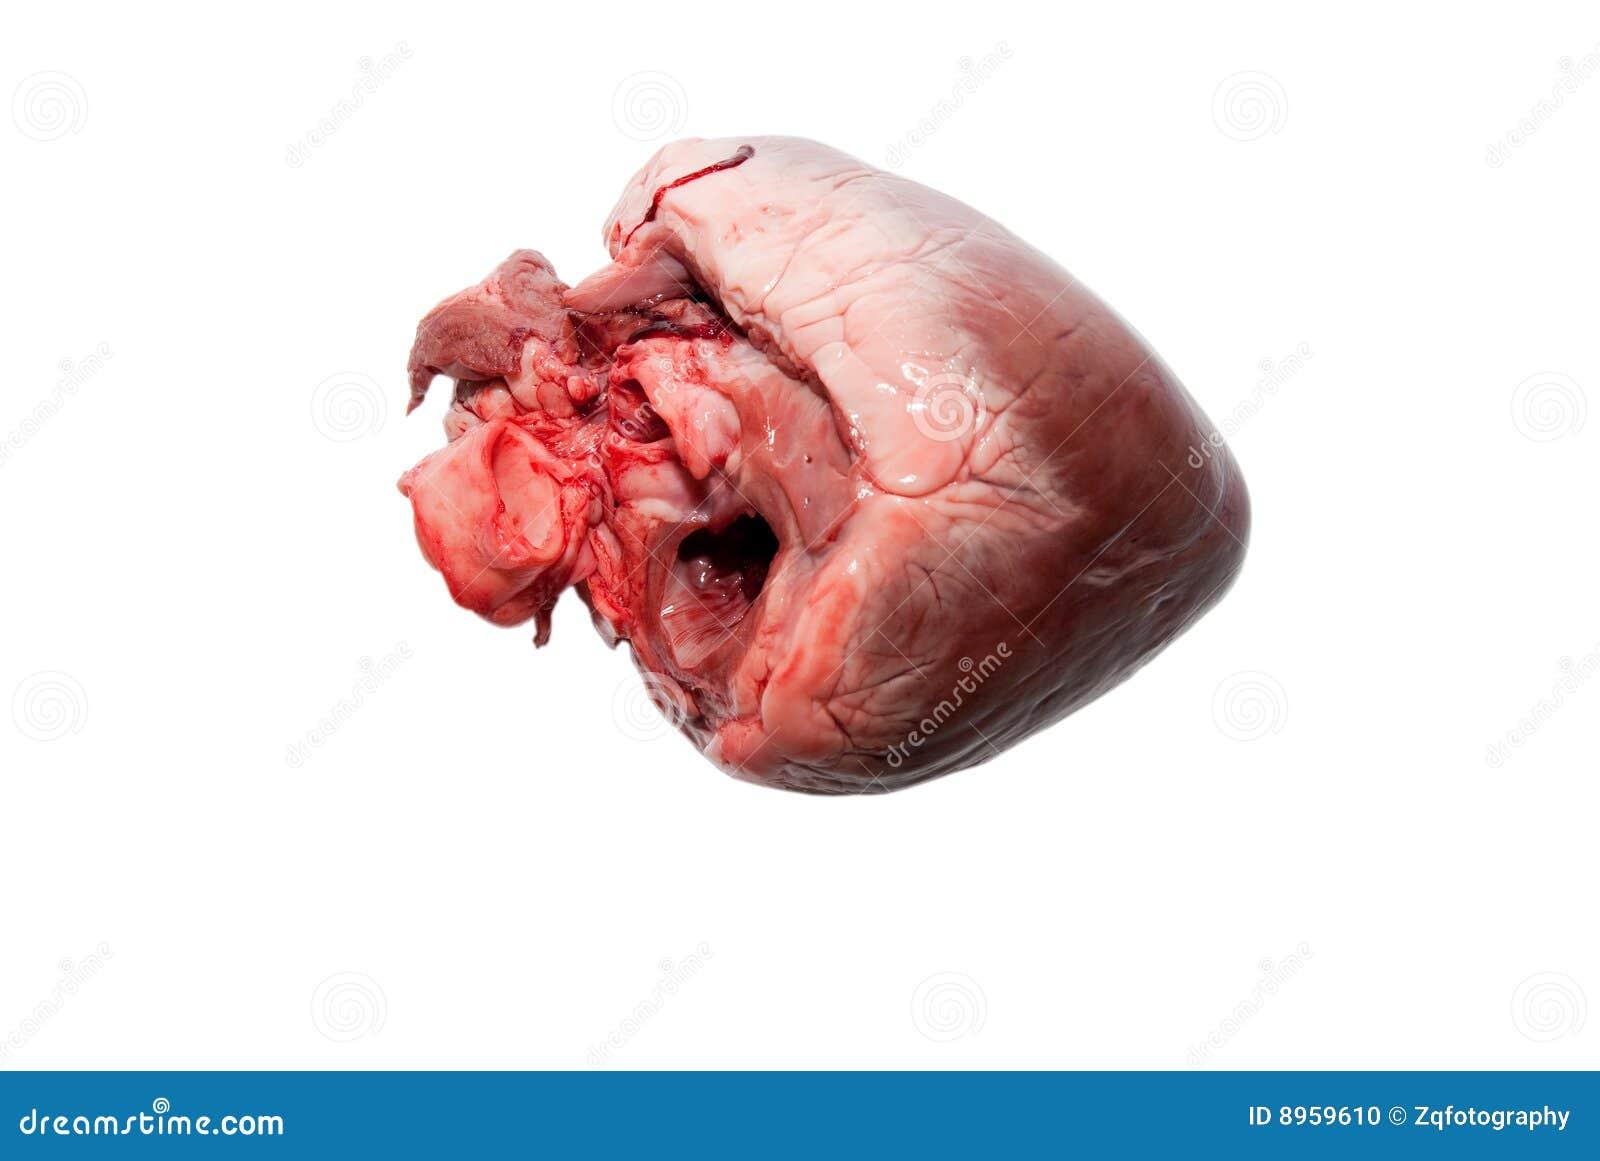 Raw animal heart isolated on white background.